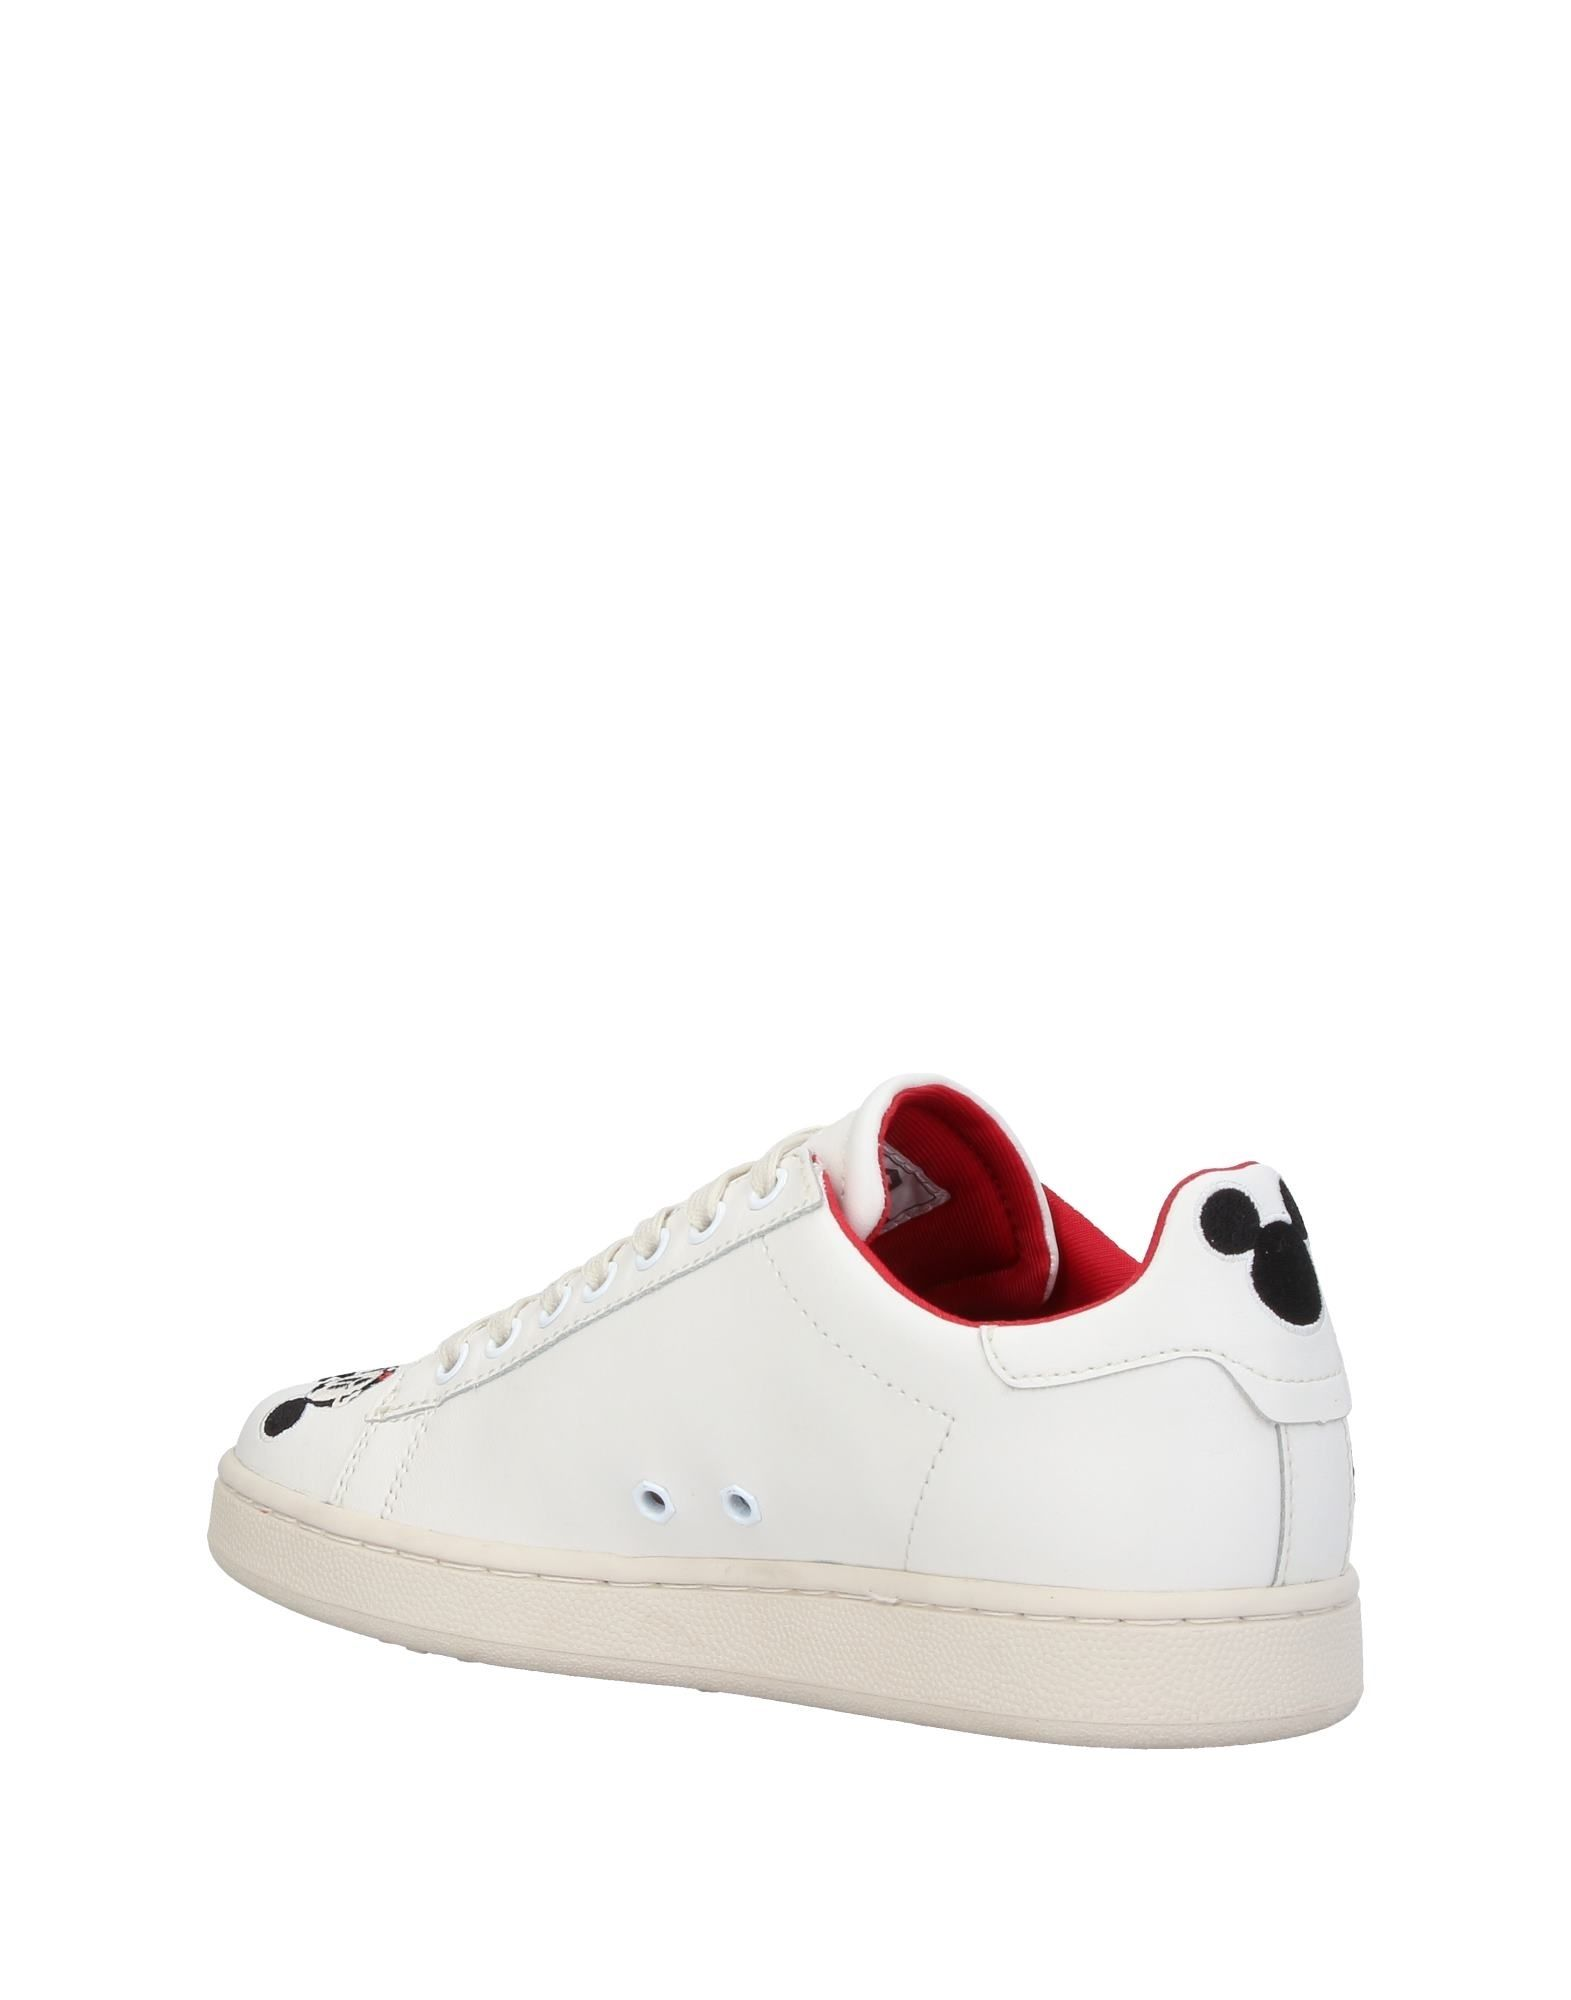 Moa Master Of Arts Sneakers - Women Moa Moa Moa Master Of Arts Sneakers online on  United Kingdom - 11415459GV f2539d